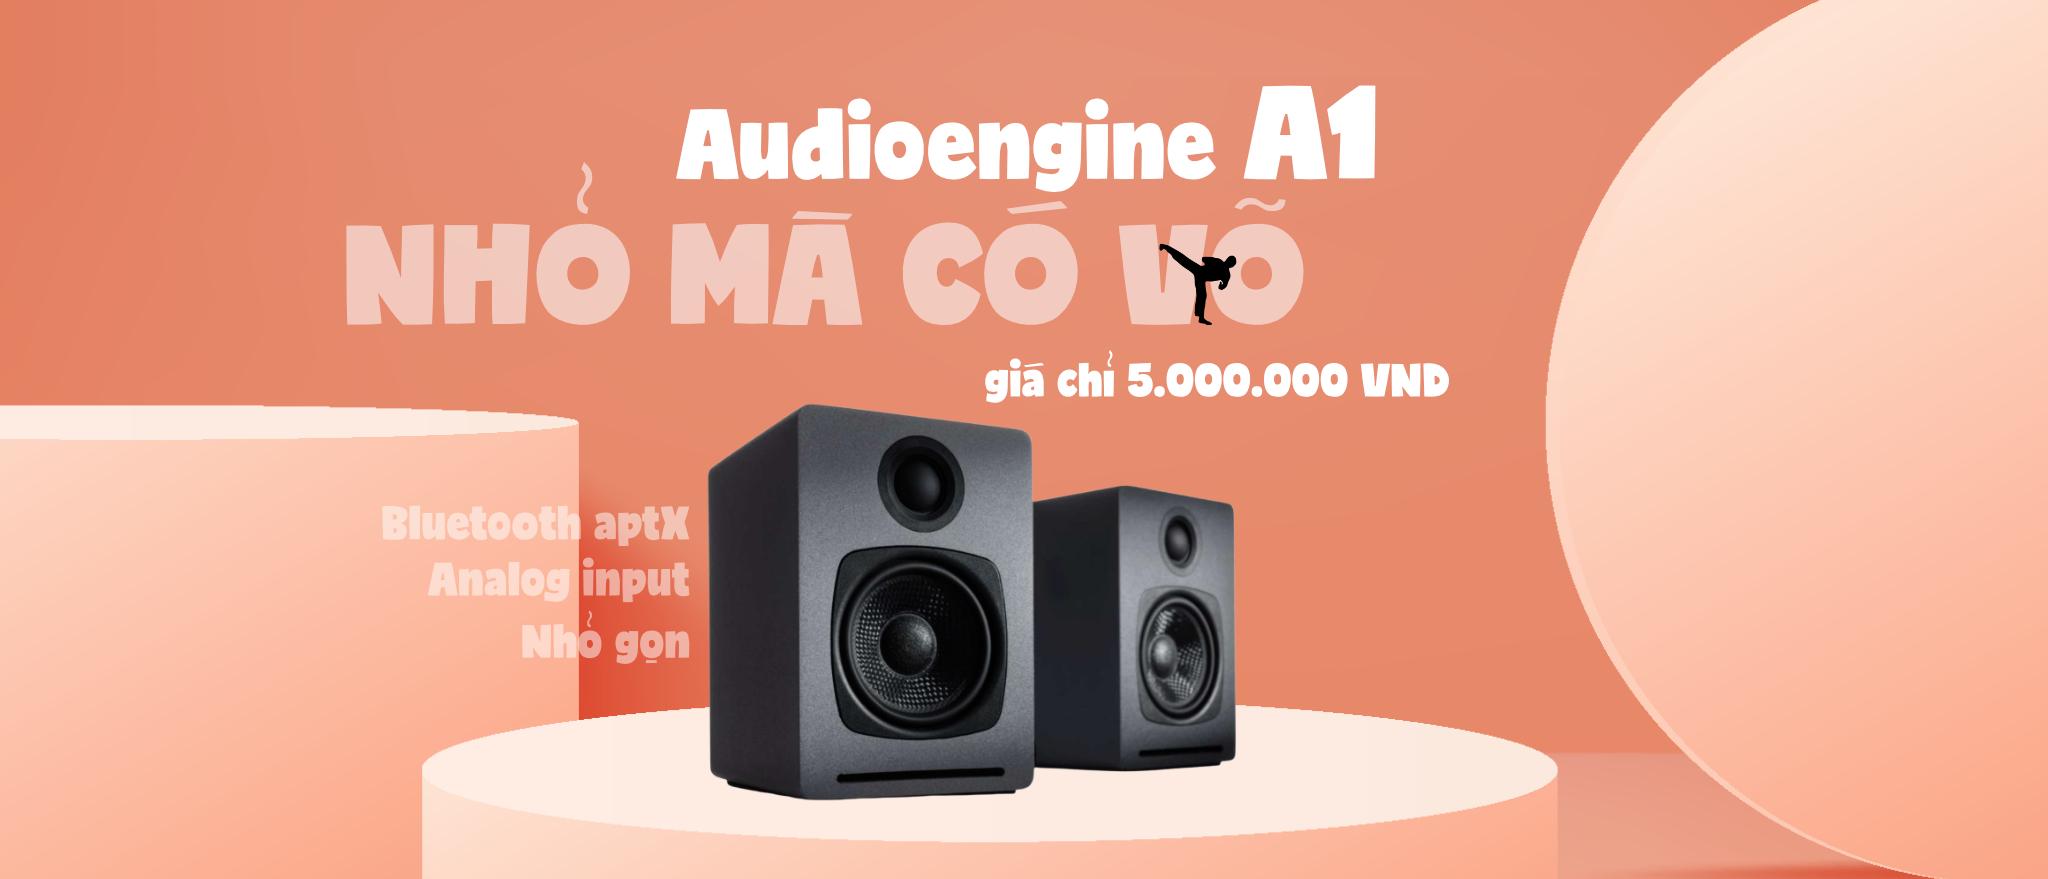 Loa máy tính Audioengine A1 chính hãng